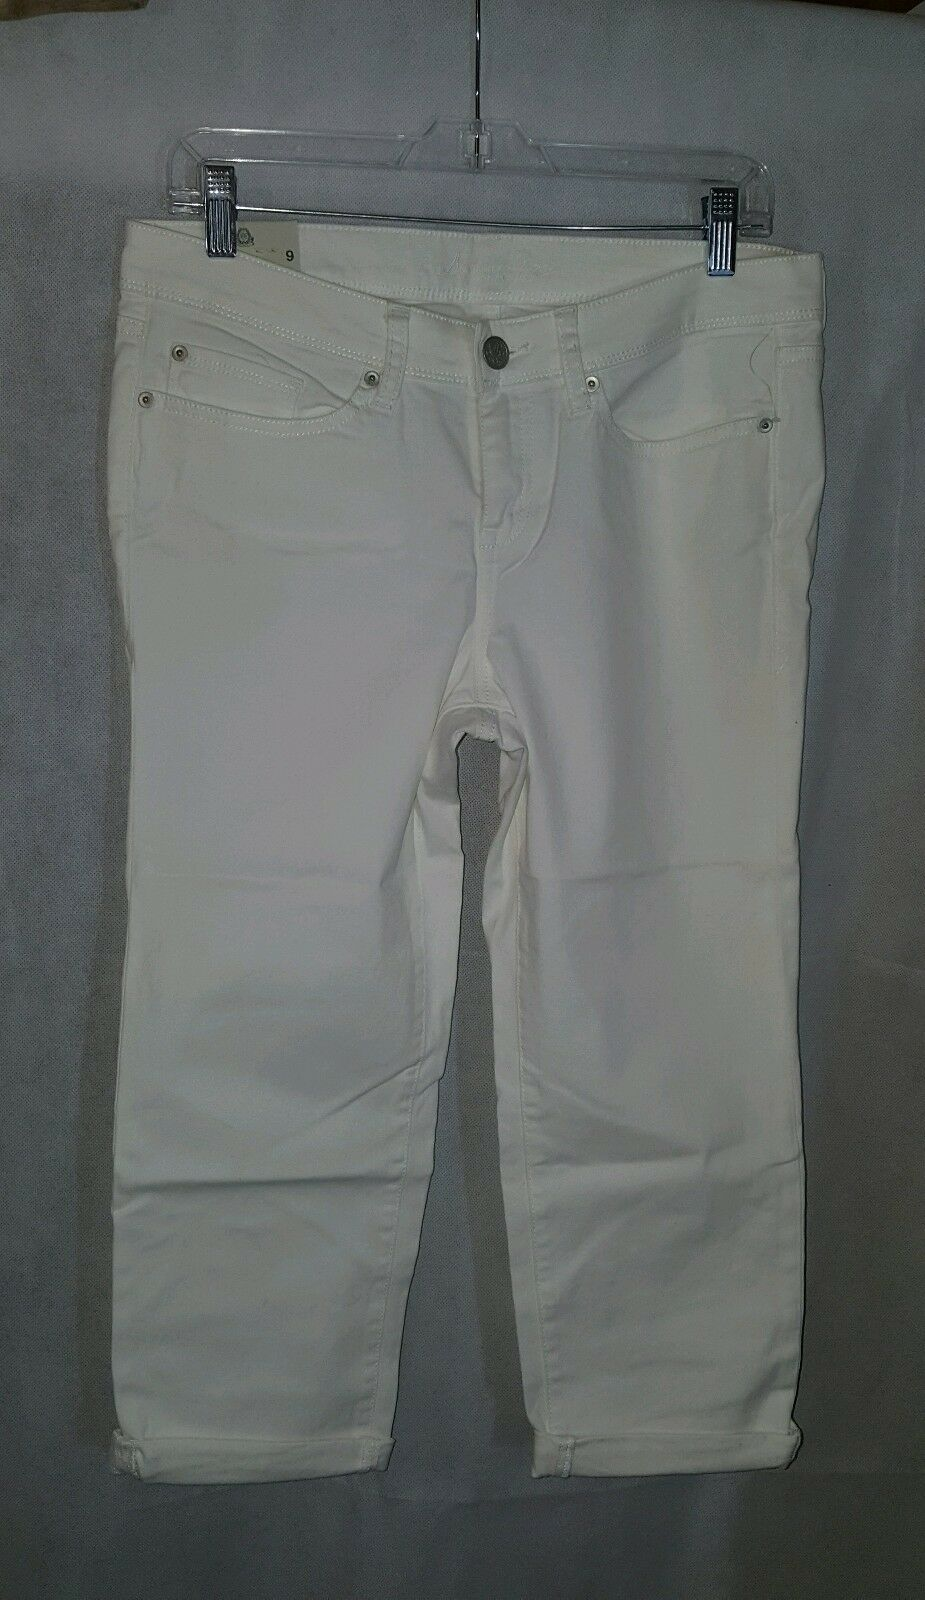 AMERICAN RAG  85 WHITE SZ 9 WOMEN'S COTTON BLEND CASUAL CAPRIS new w tags